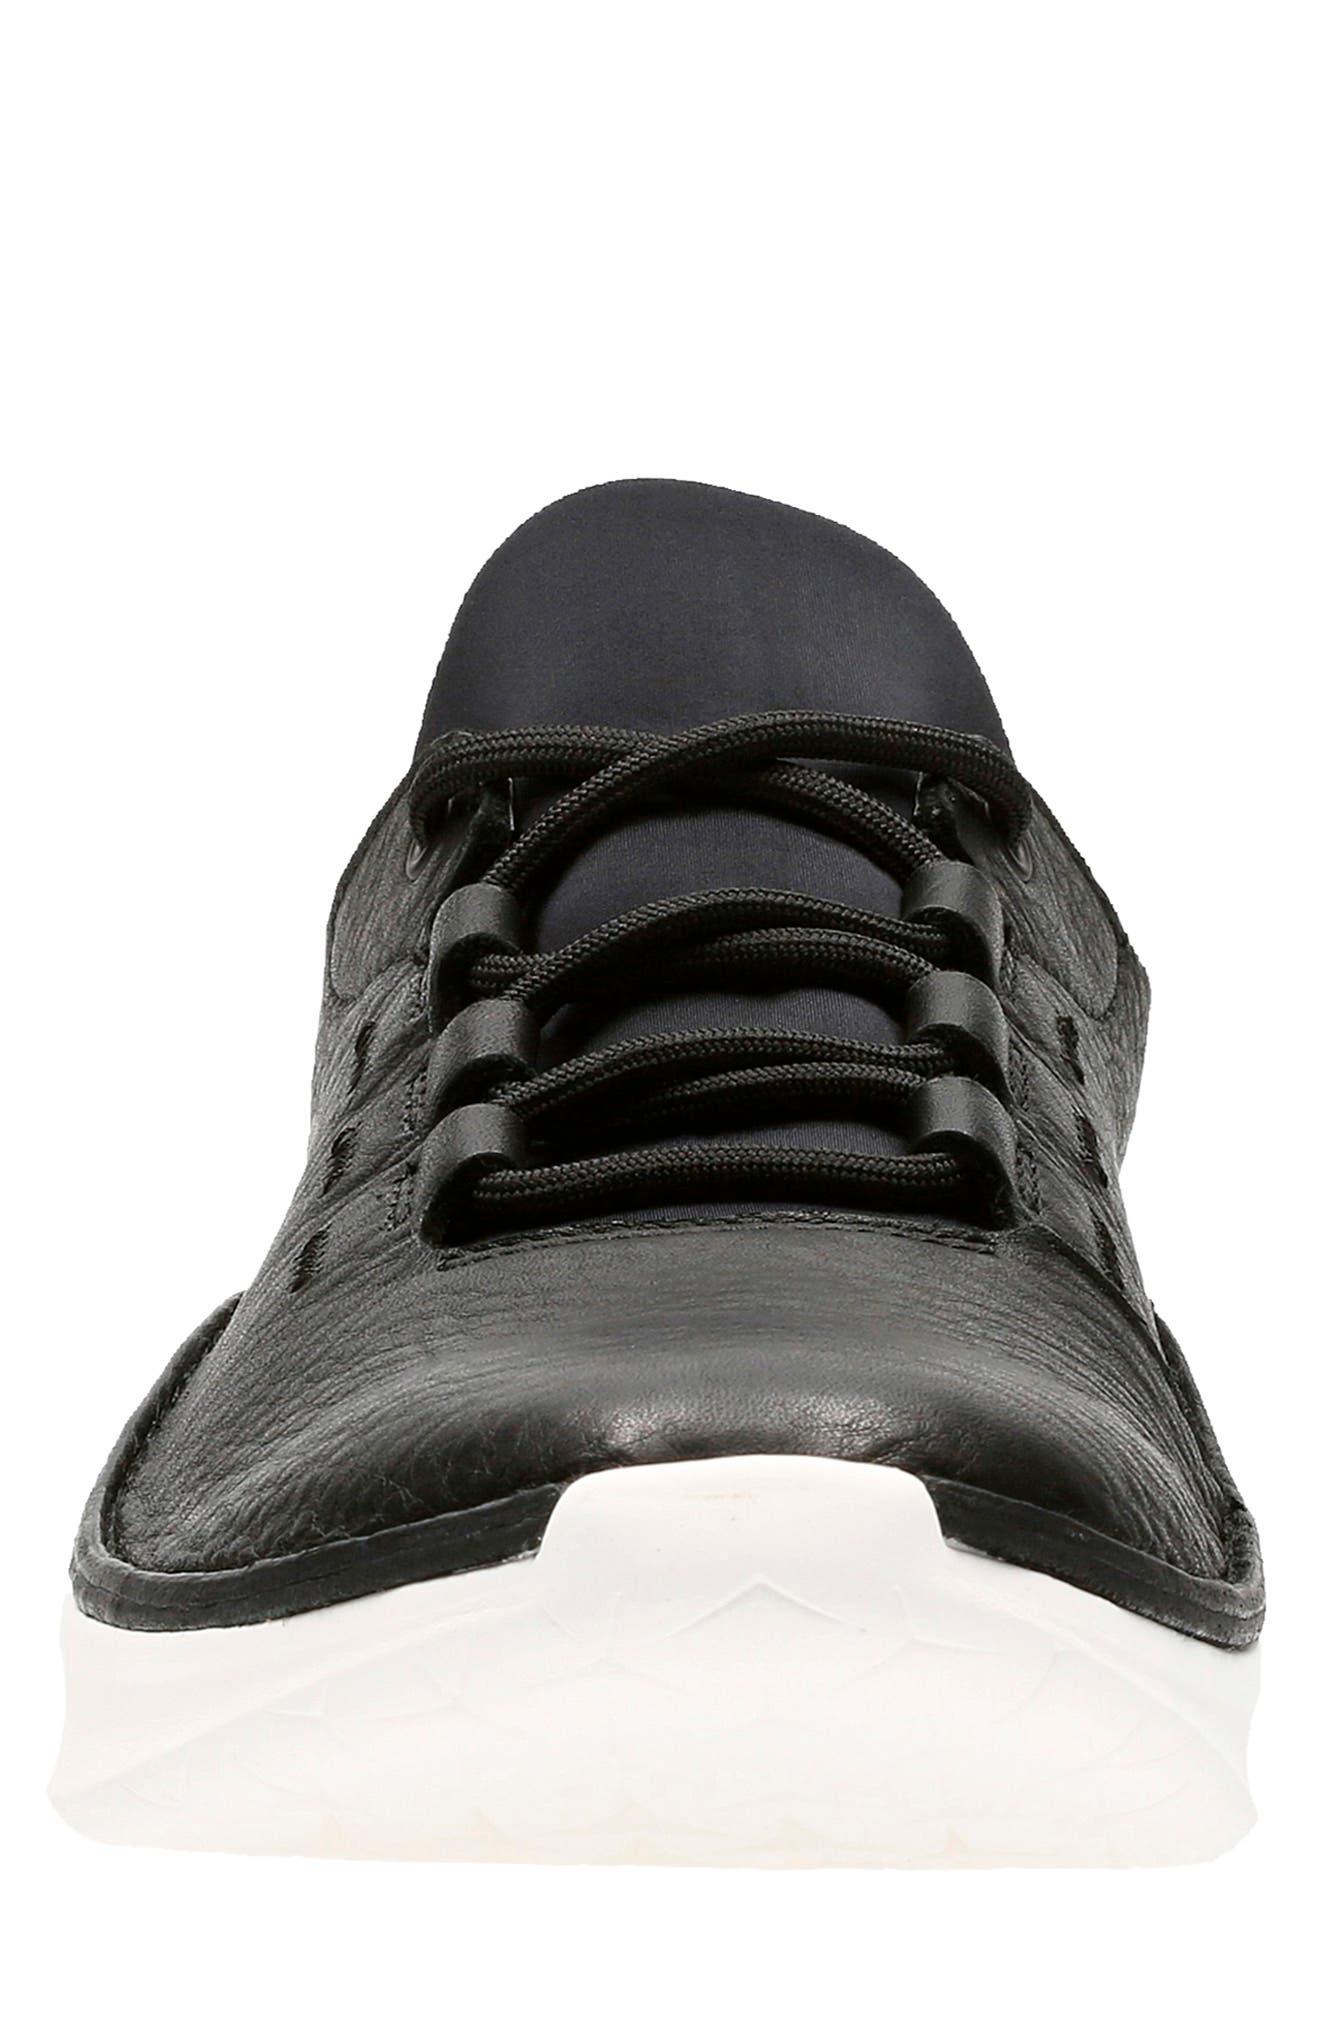 Privolution Lo Sneaker,                             Alternate thumbnail 3, color,                             BLACKOUT